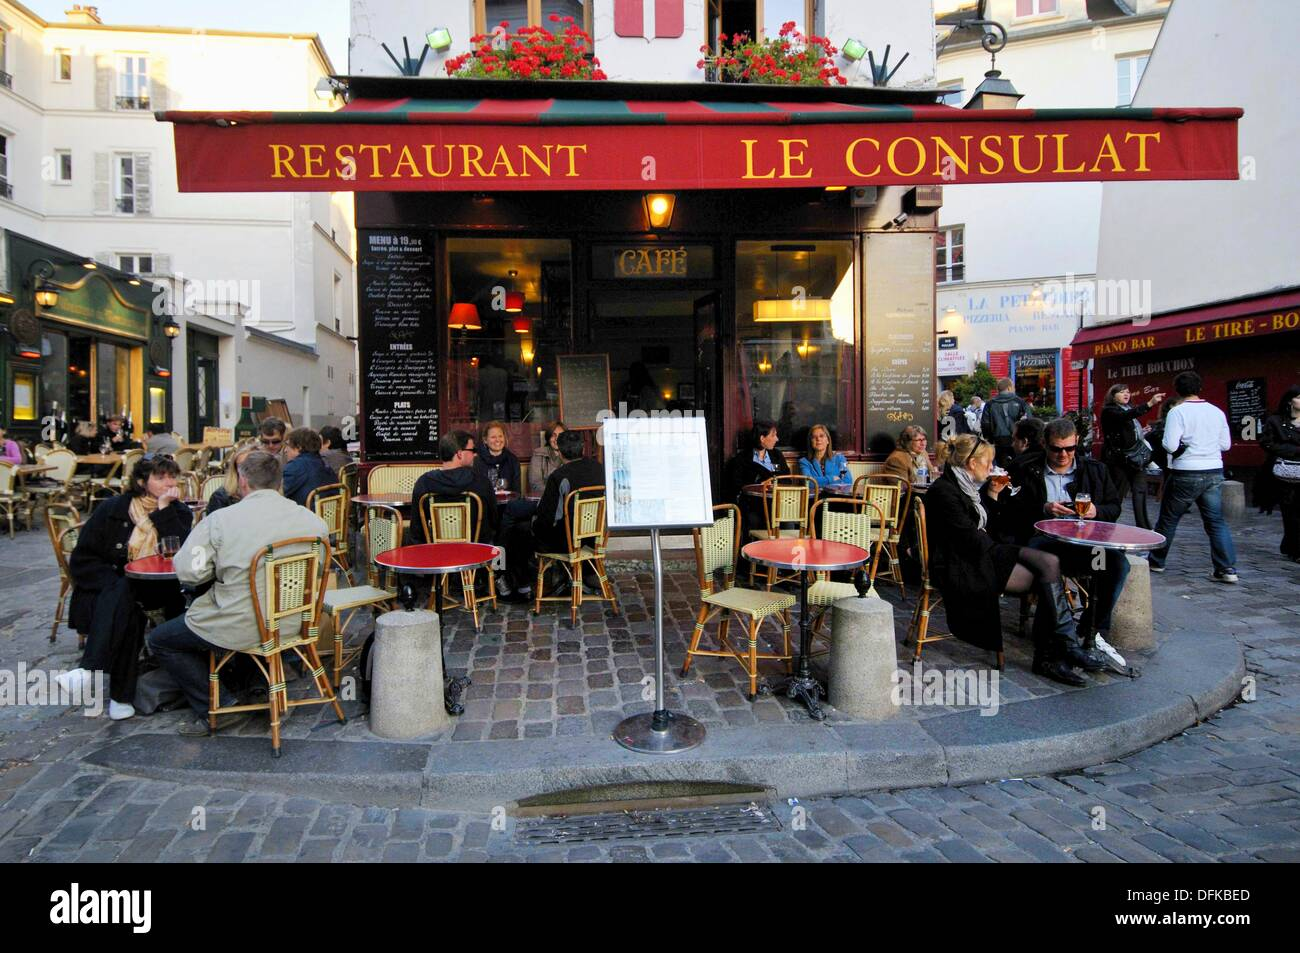 Le consulat restaurant 18 norvins street montmartre for Le miroir restaurant montmartre